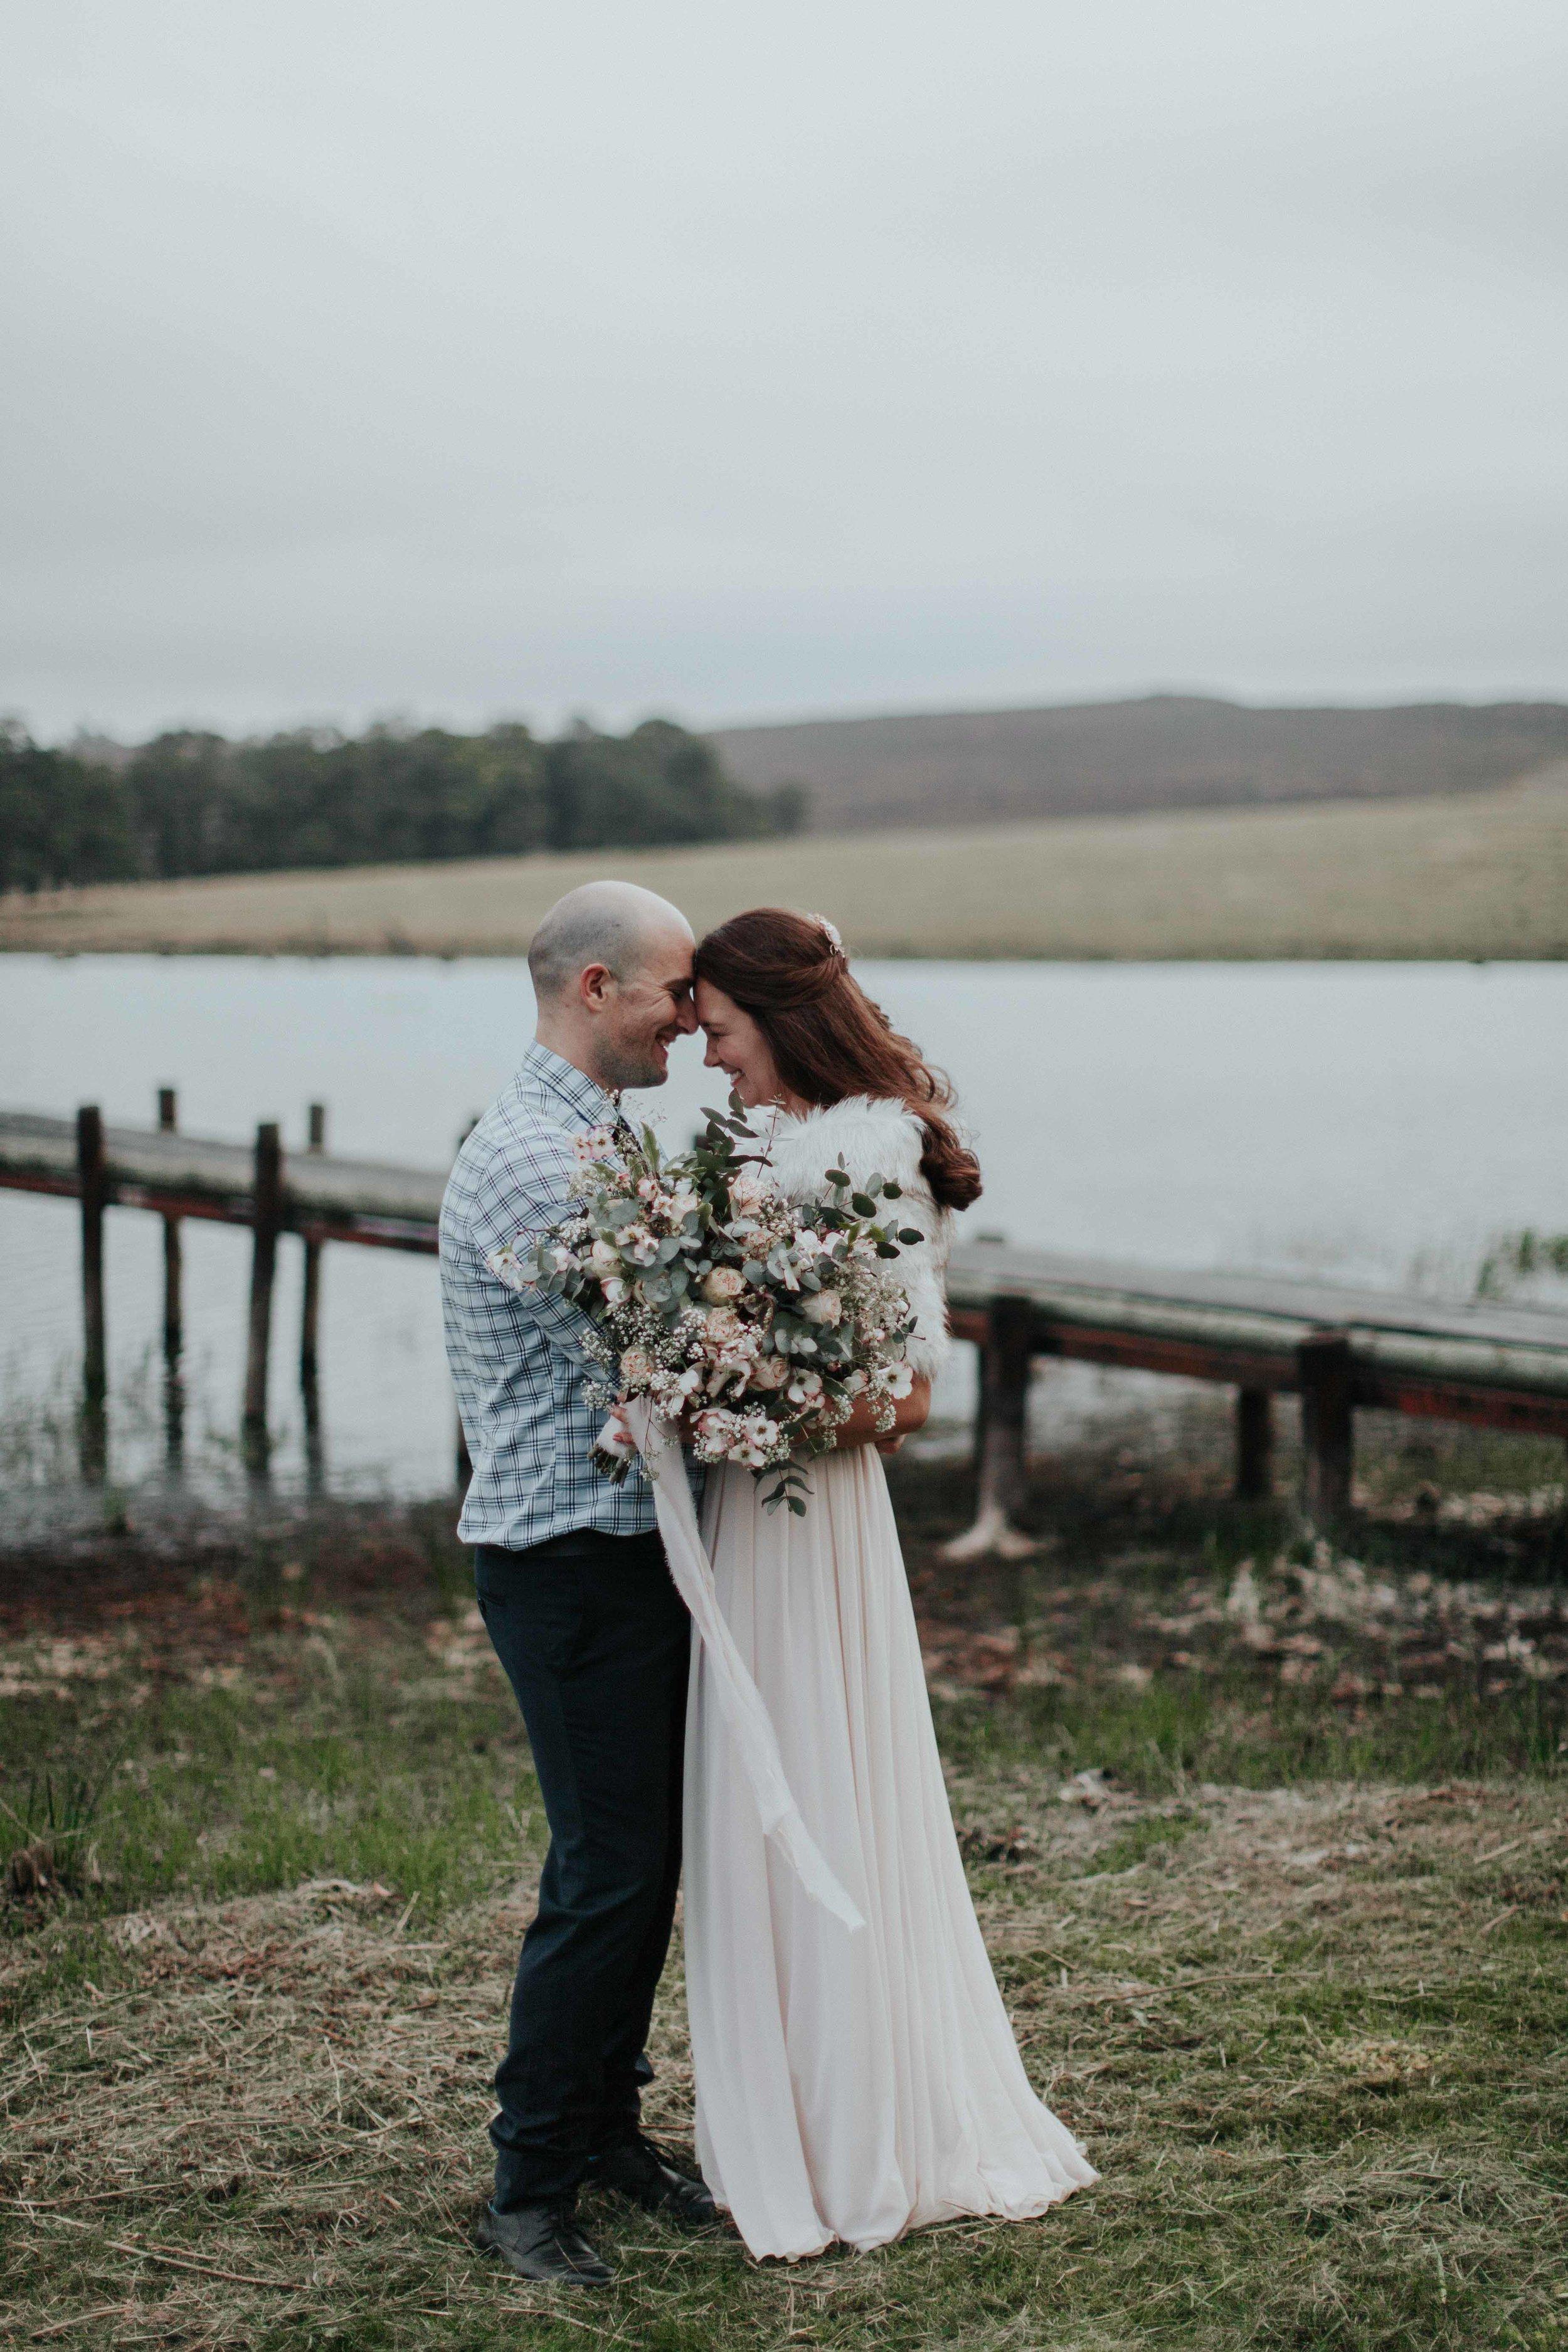 Kristi Smith Photography - Wedding Photographer - Kev and Kirst 13.jpg